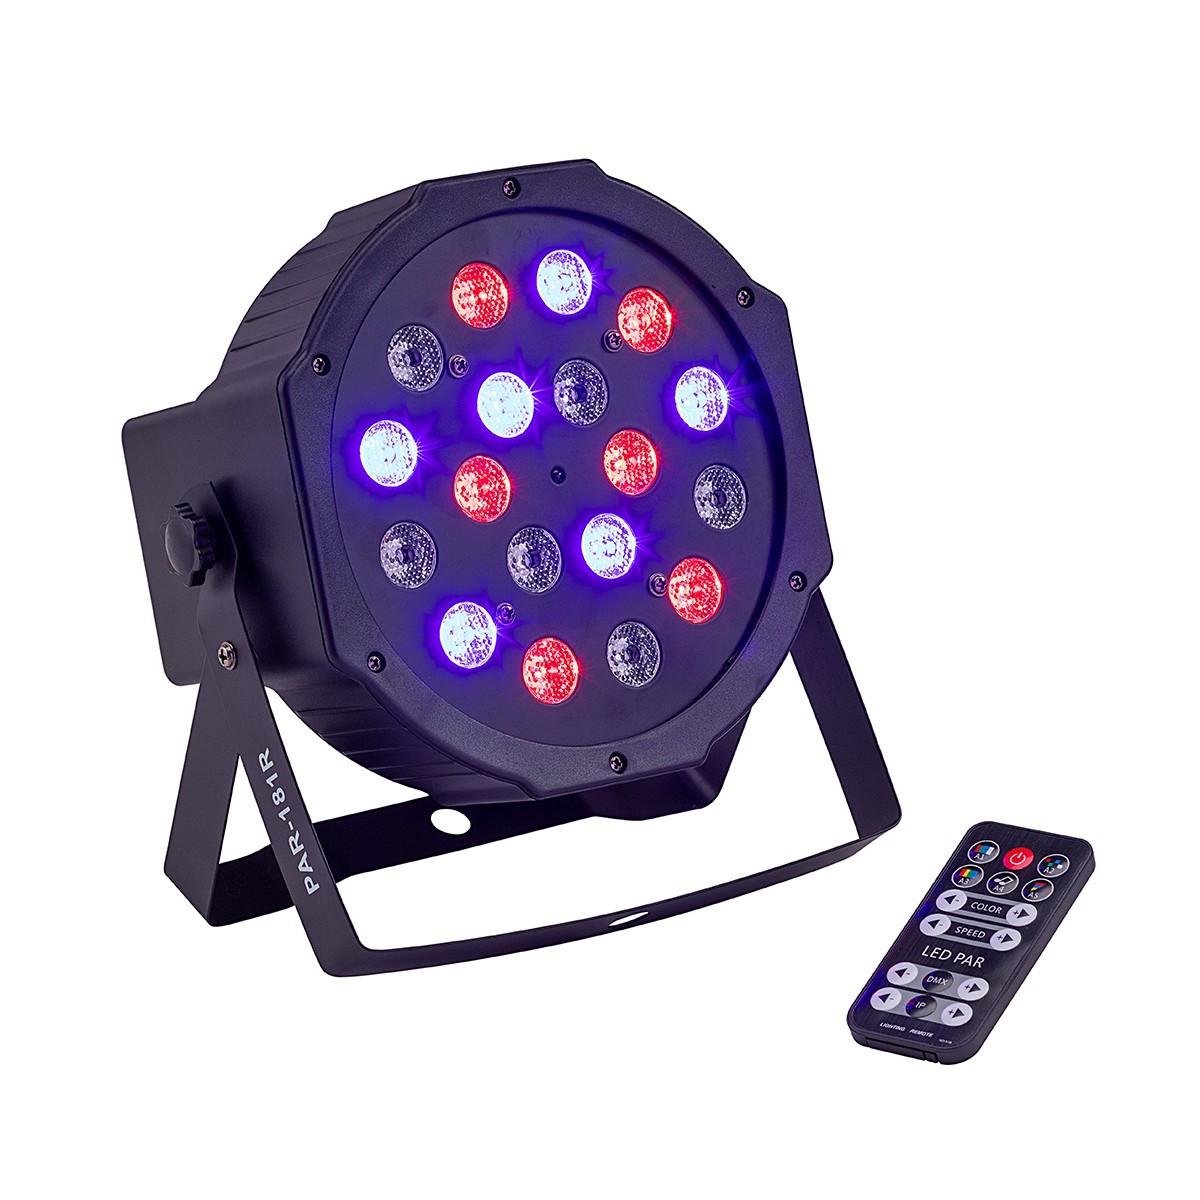 PROIETTORE LED SOUNDSATION PAR-181R 18X1W 6R 6G 6B CON TELECOMANDO